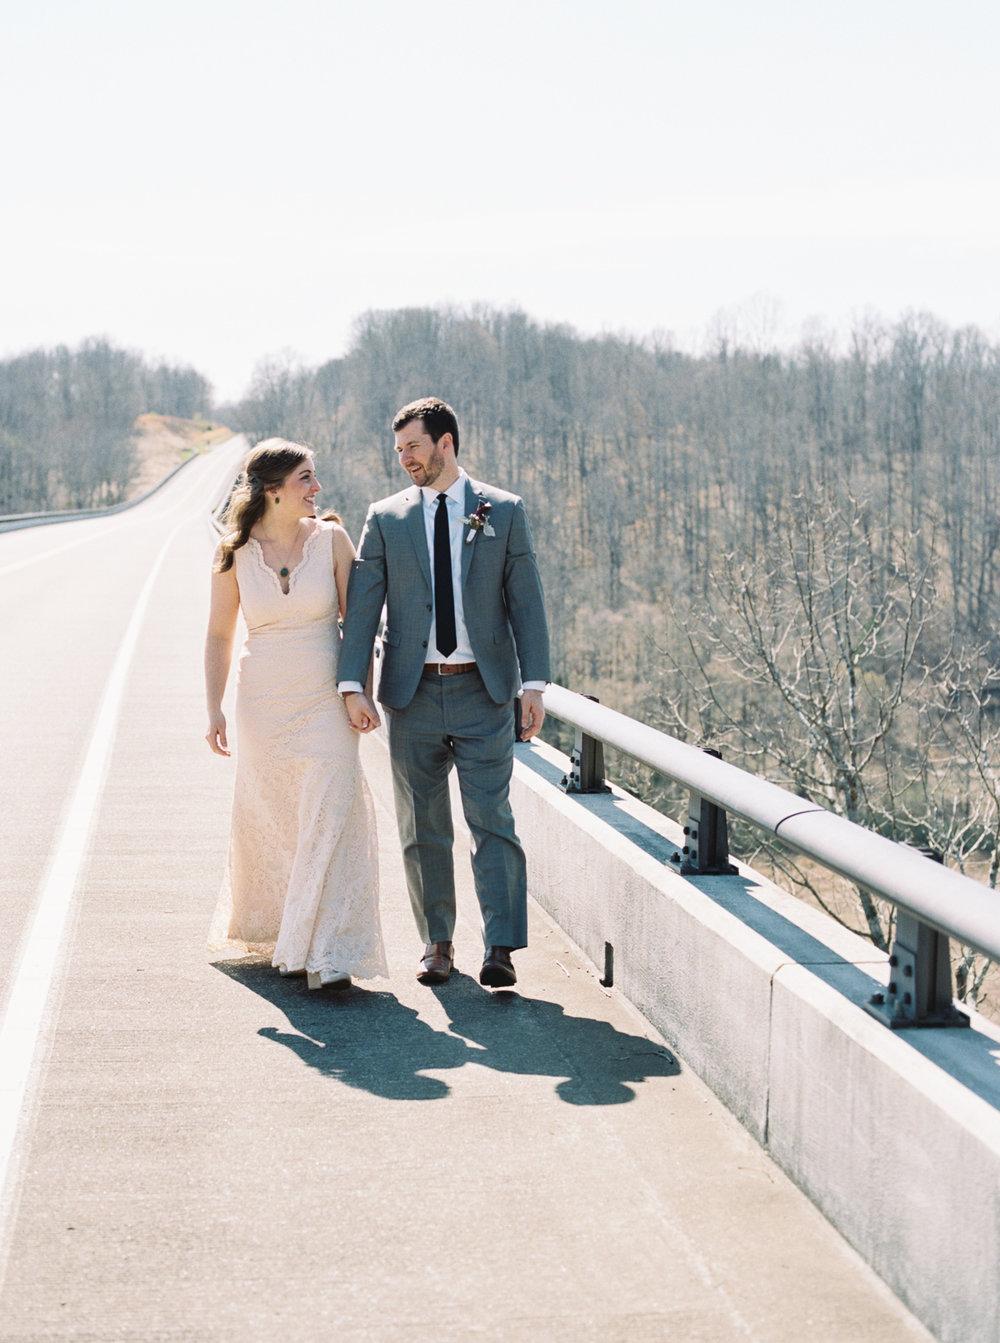 laurel+kelly_natchez_trace_grays_on_main_franklin_film_wedding_photographers©2017abigailbobophotography-1-2.jpg